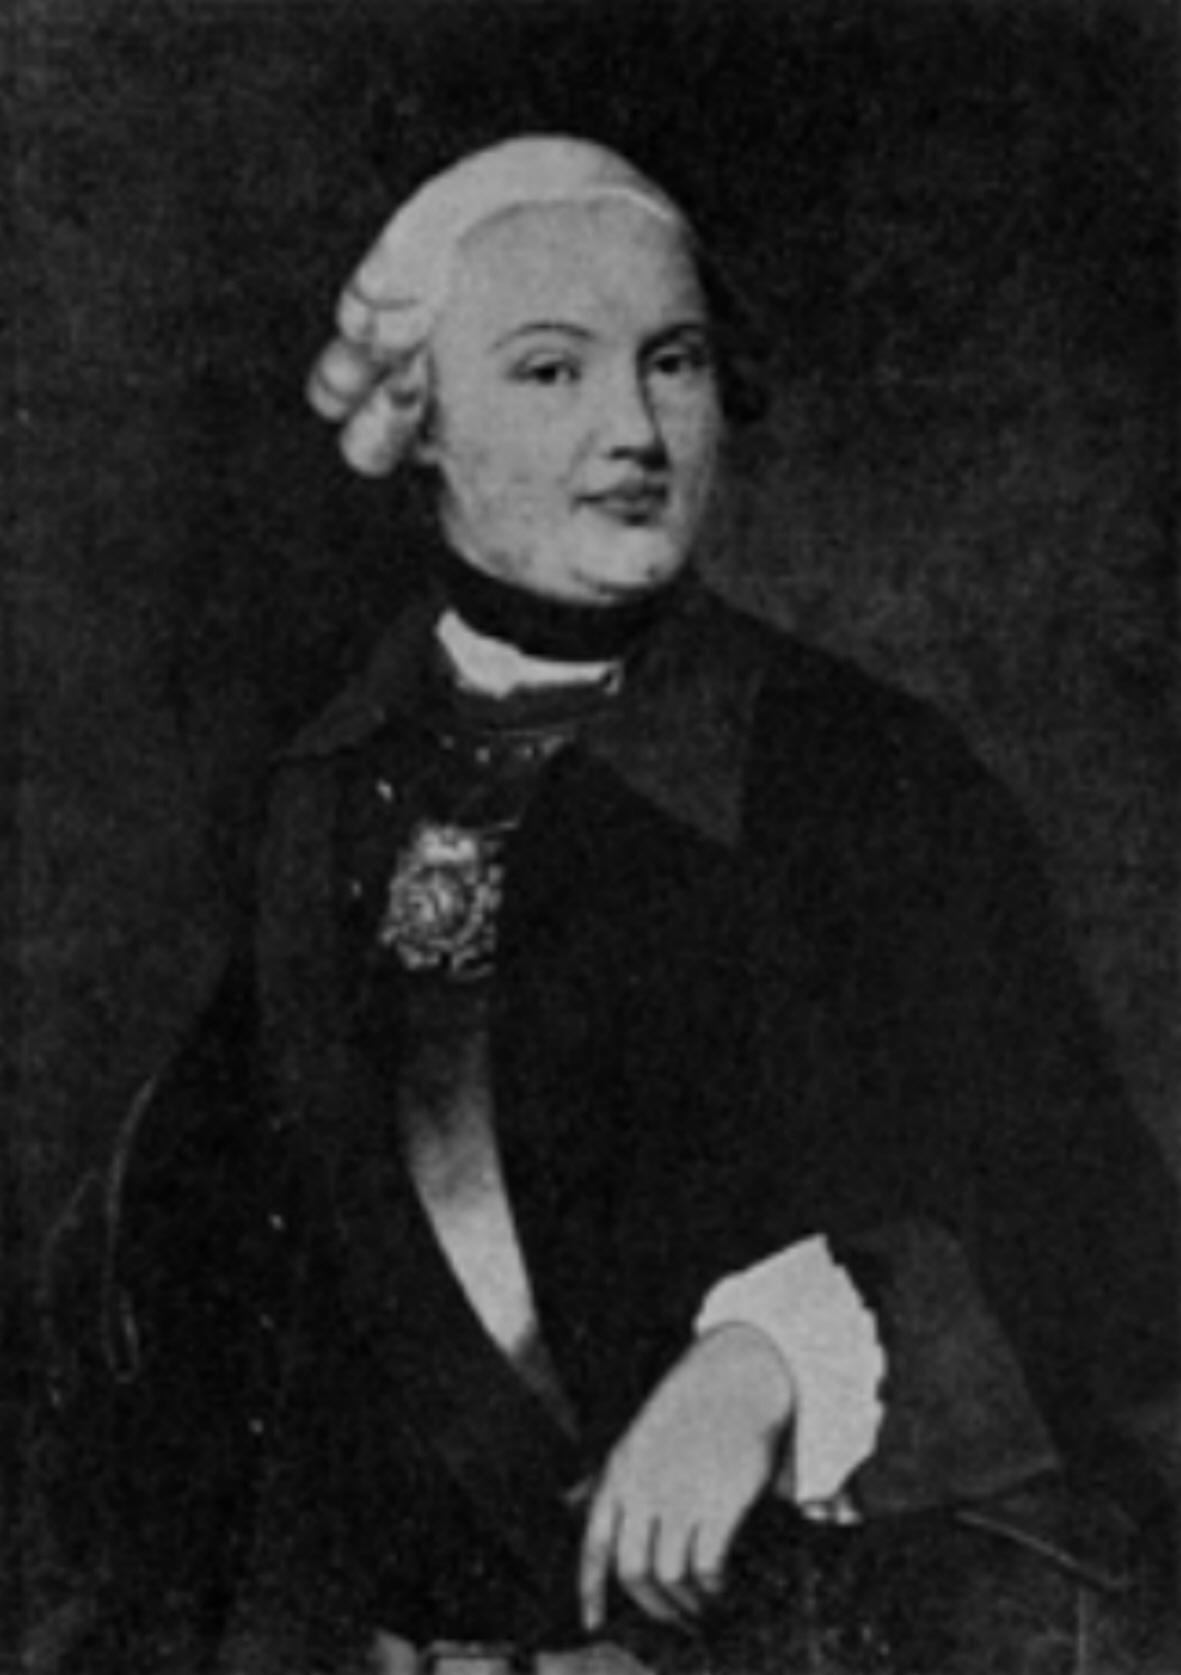 Karl Theophil Guichard